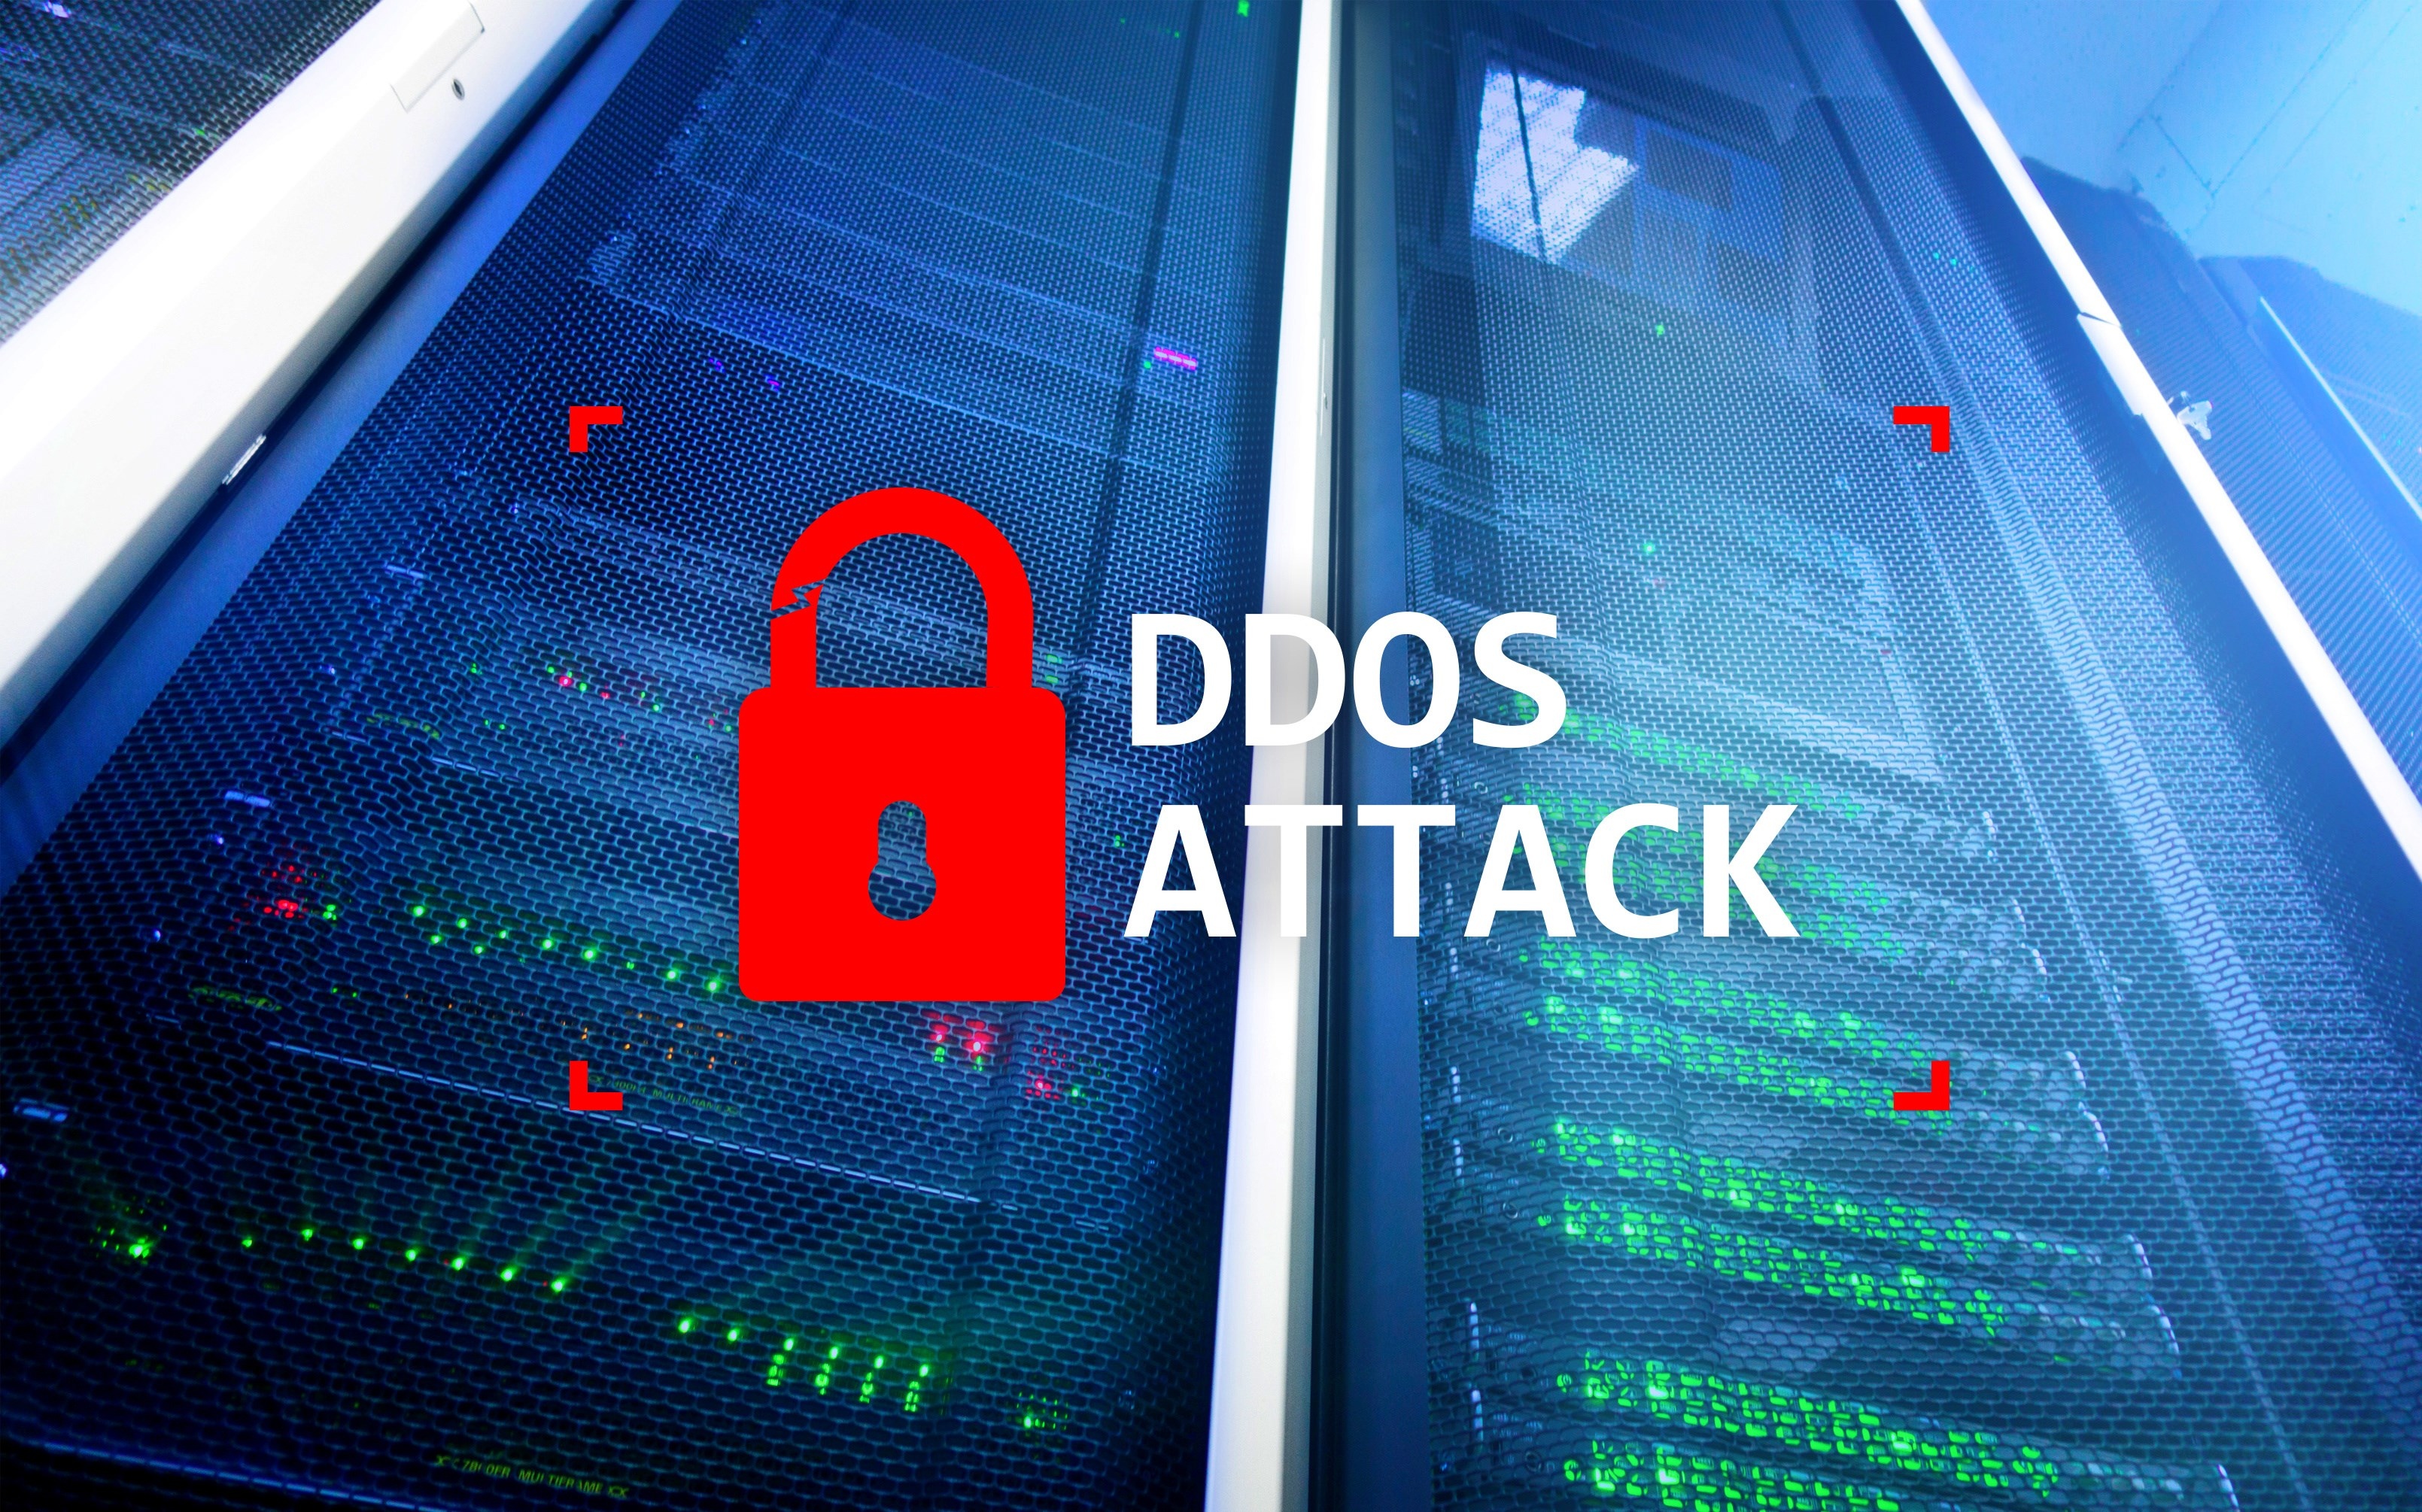 Solutions for DDoS attacks